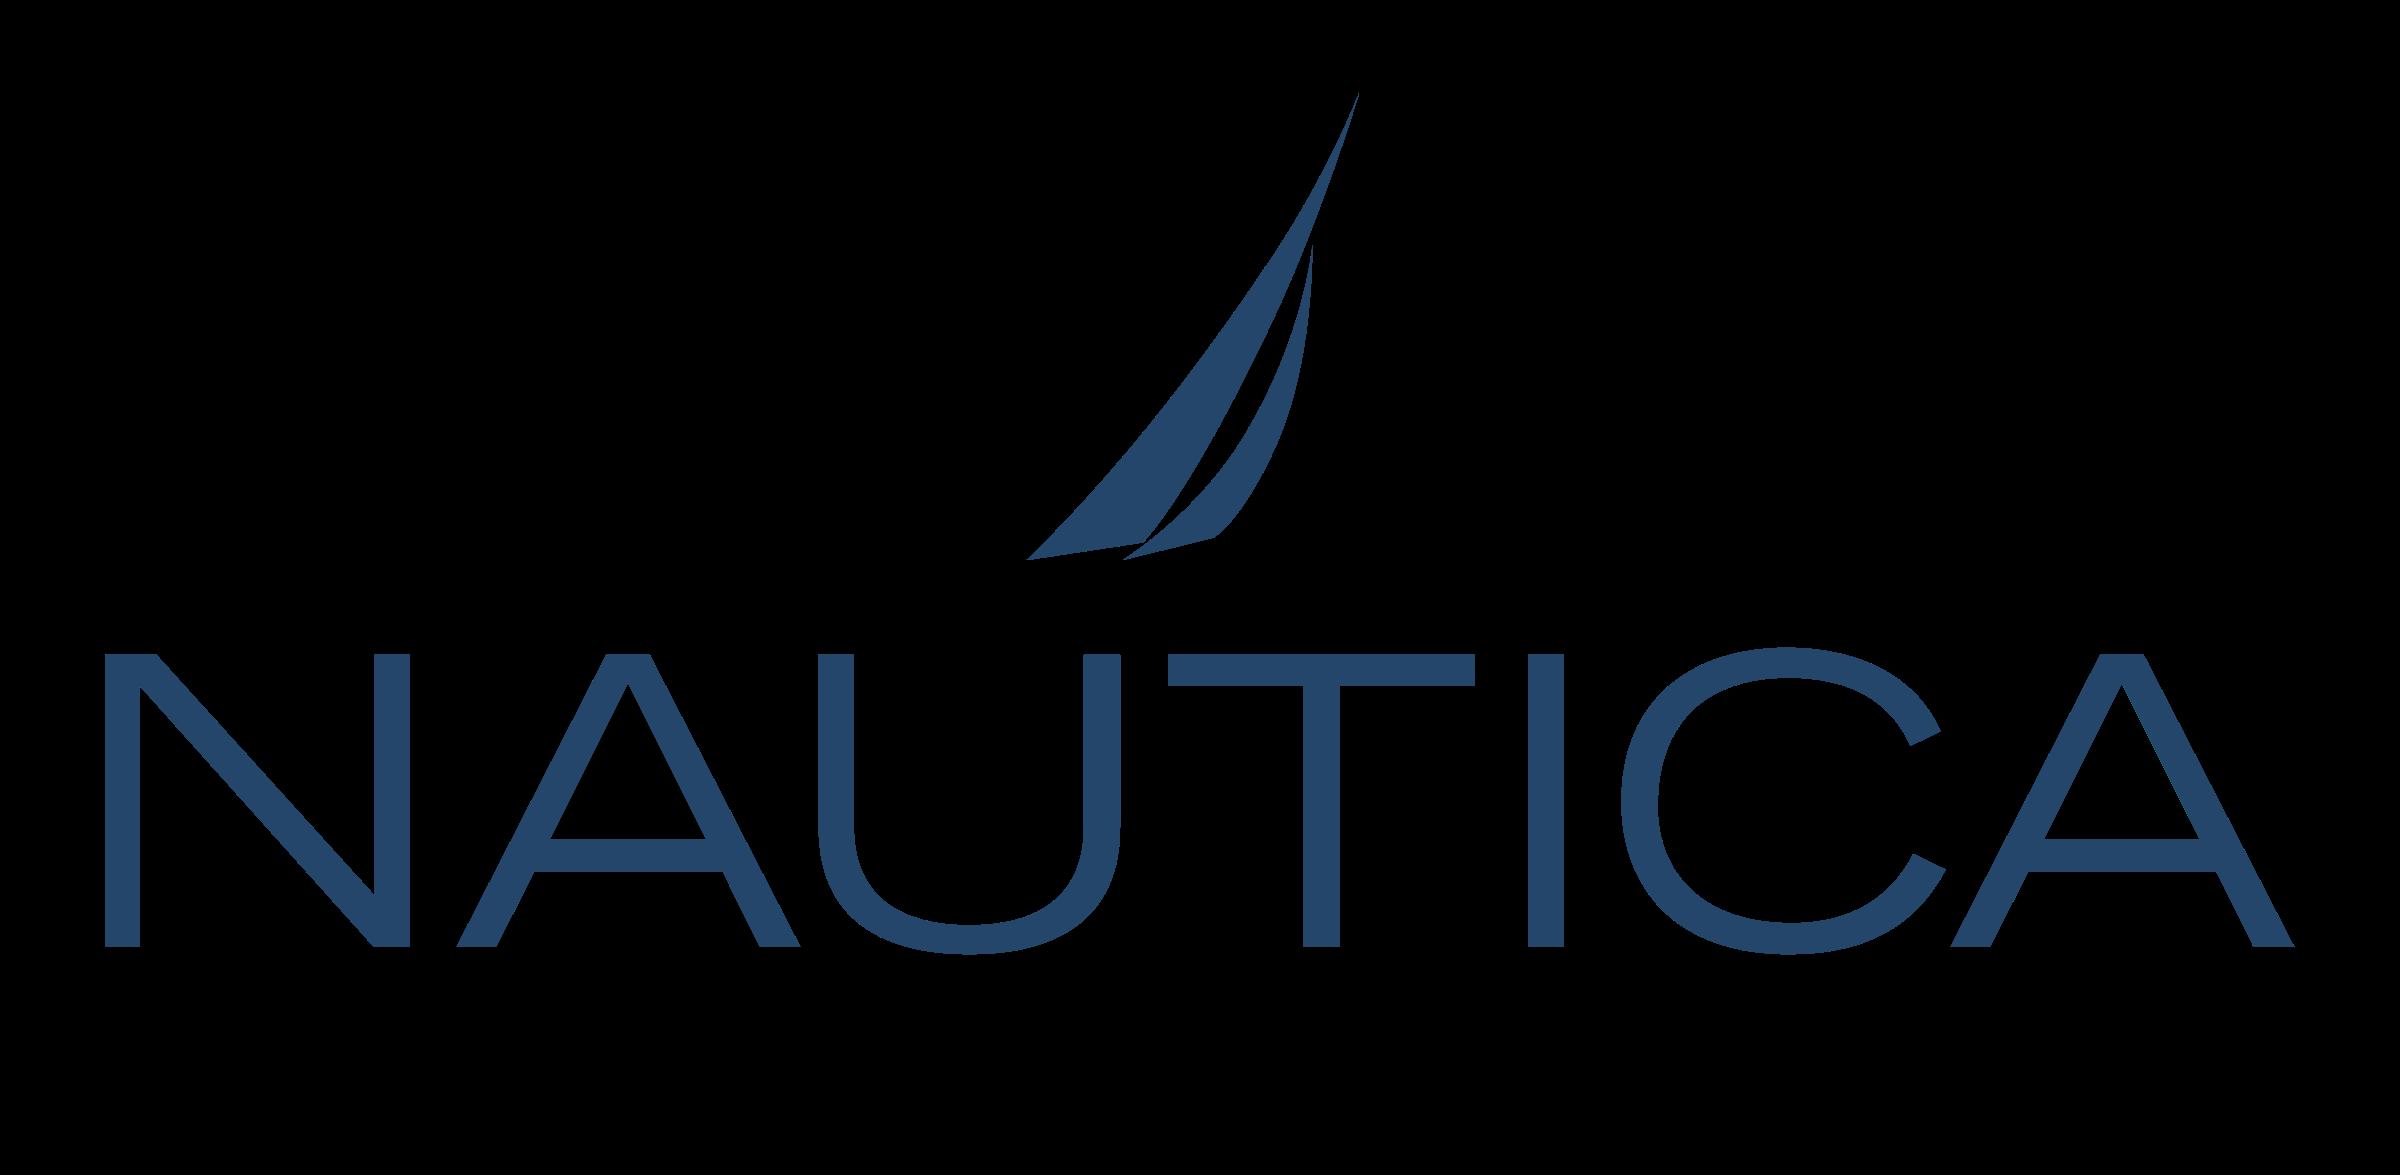 nautica-2-logo.png